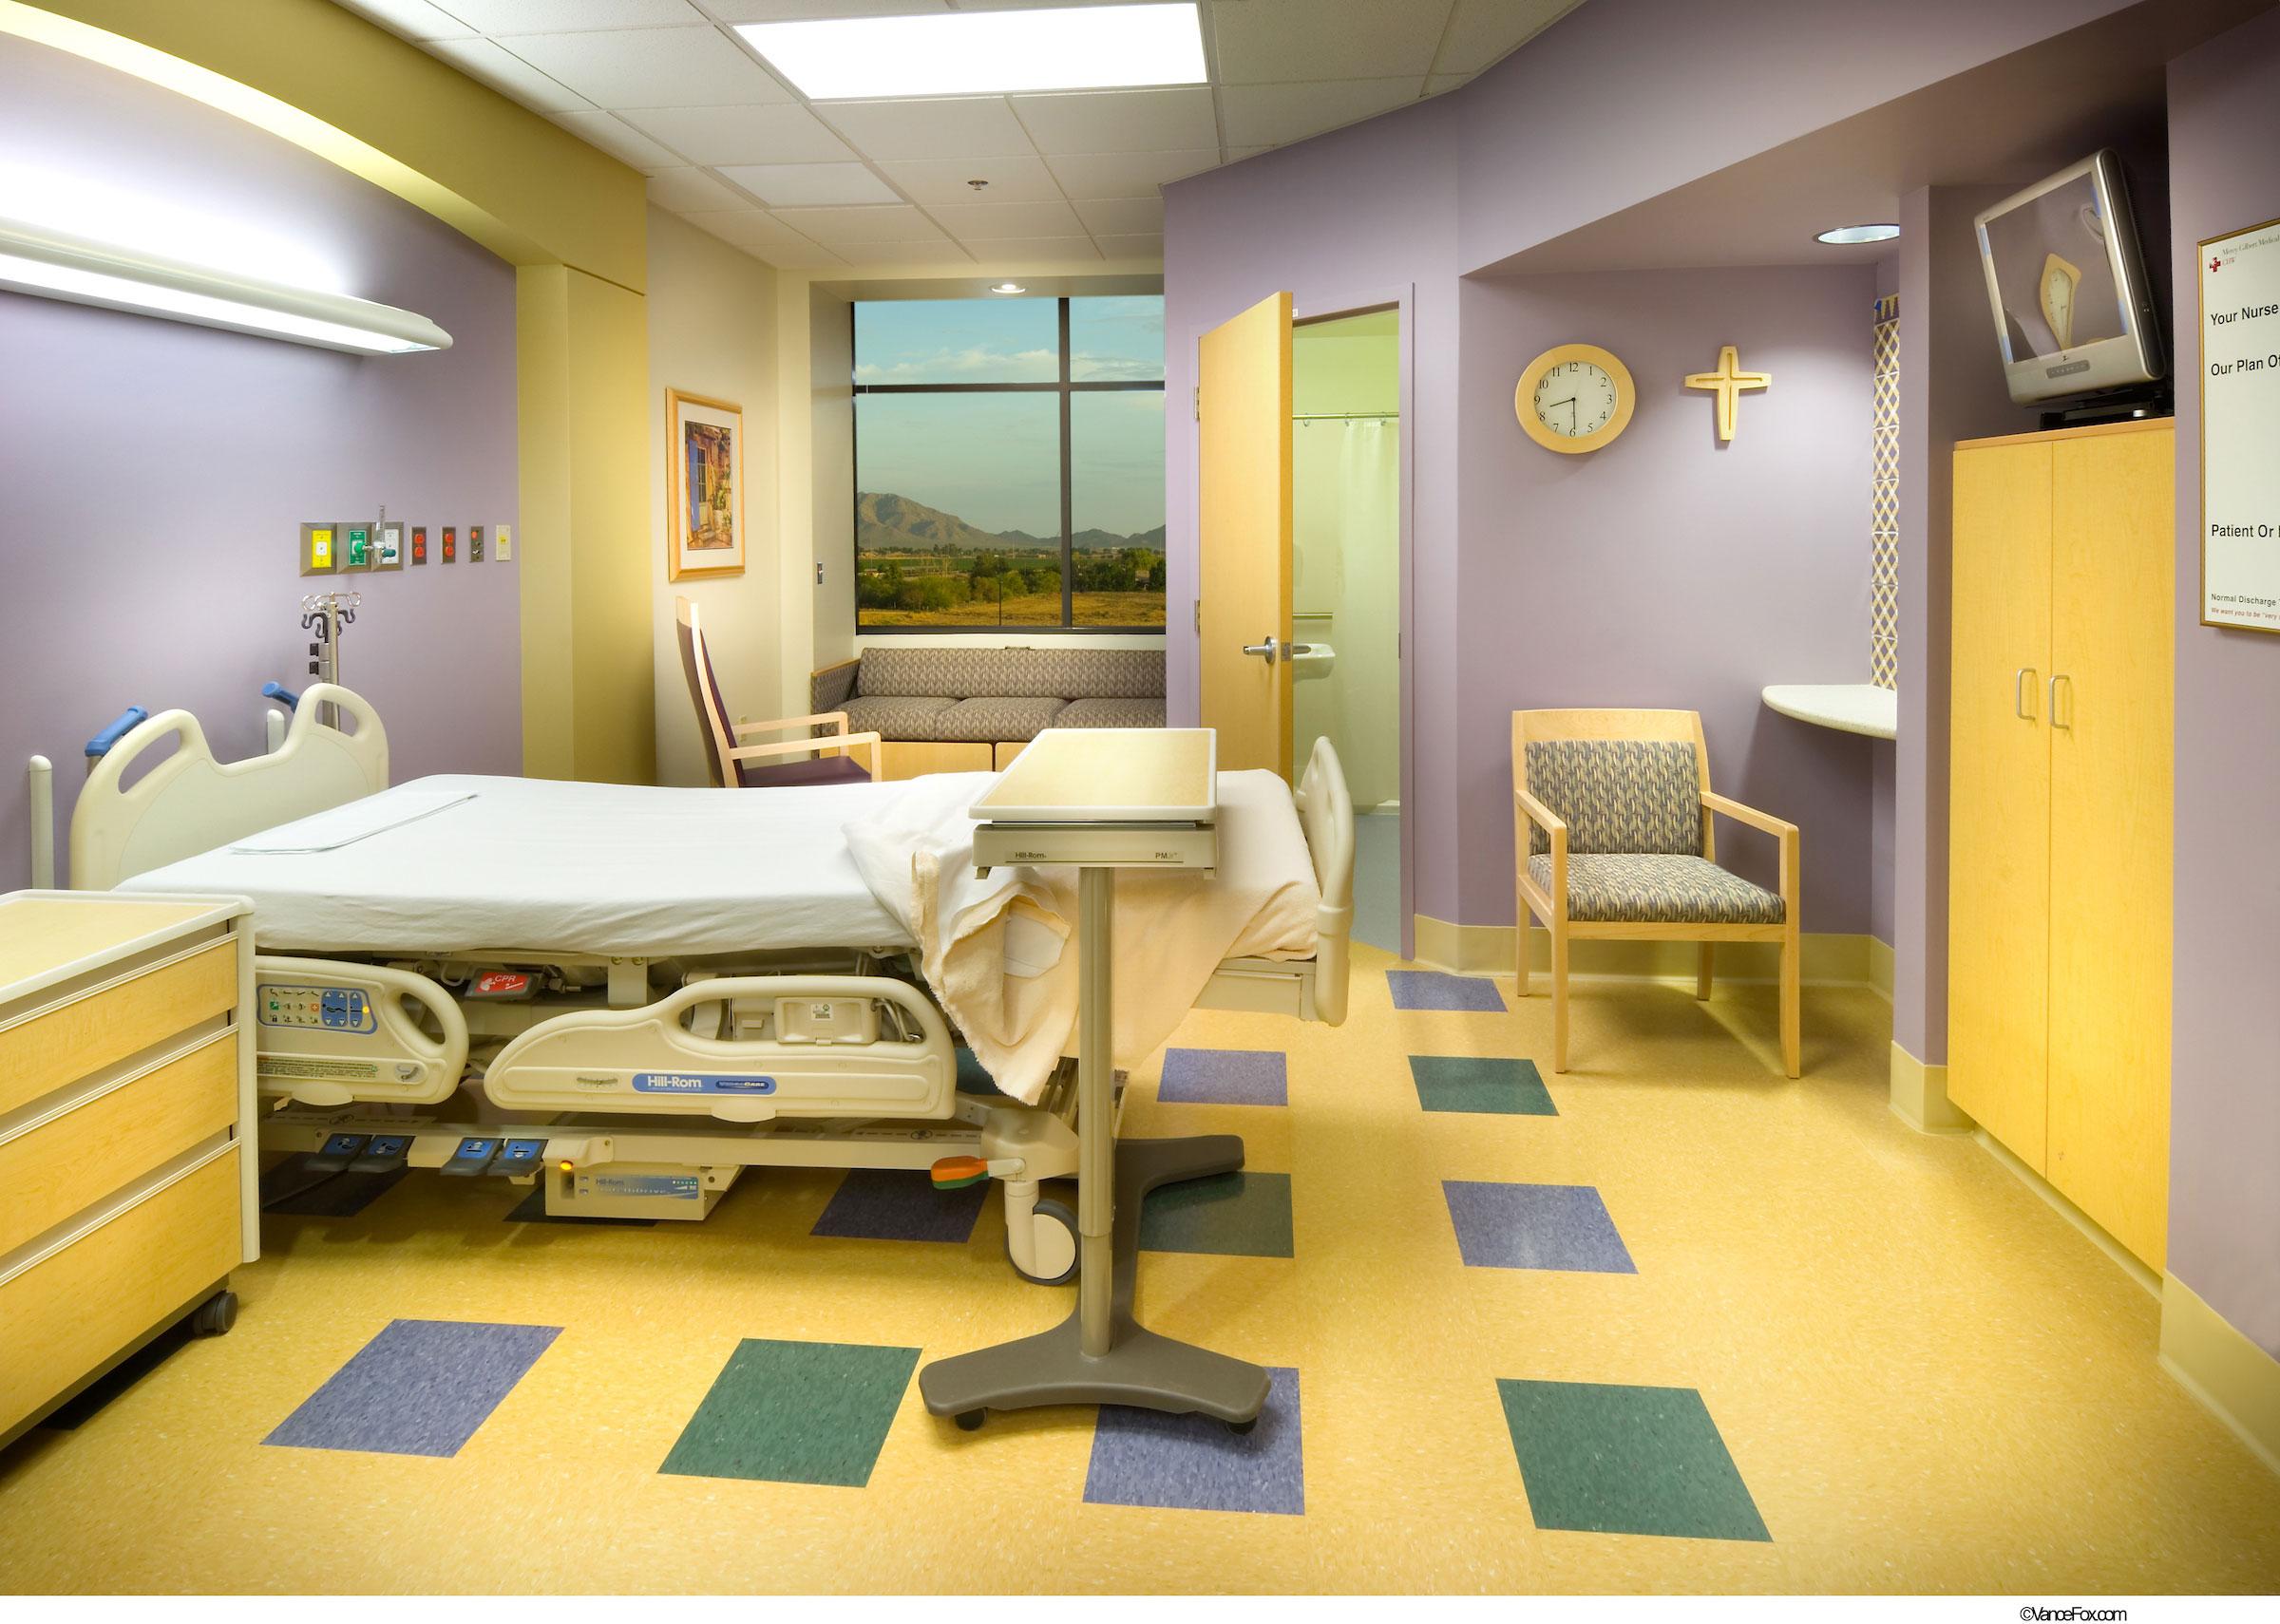 Typical Patient Room